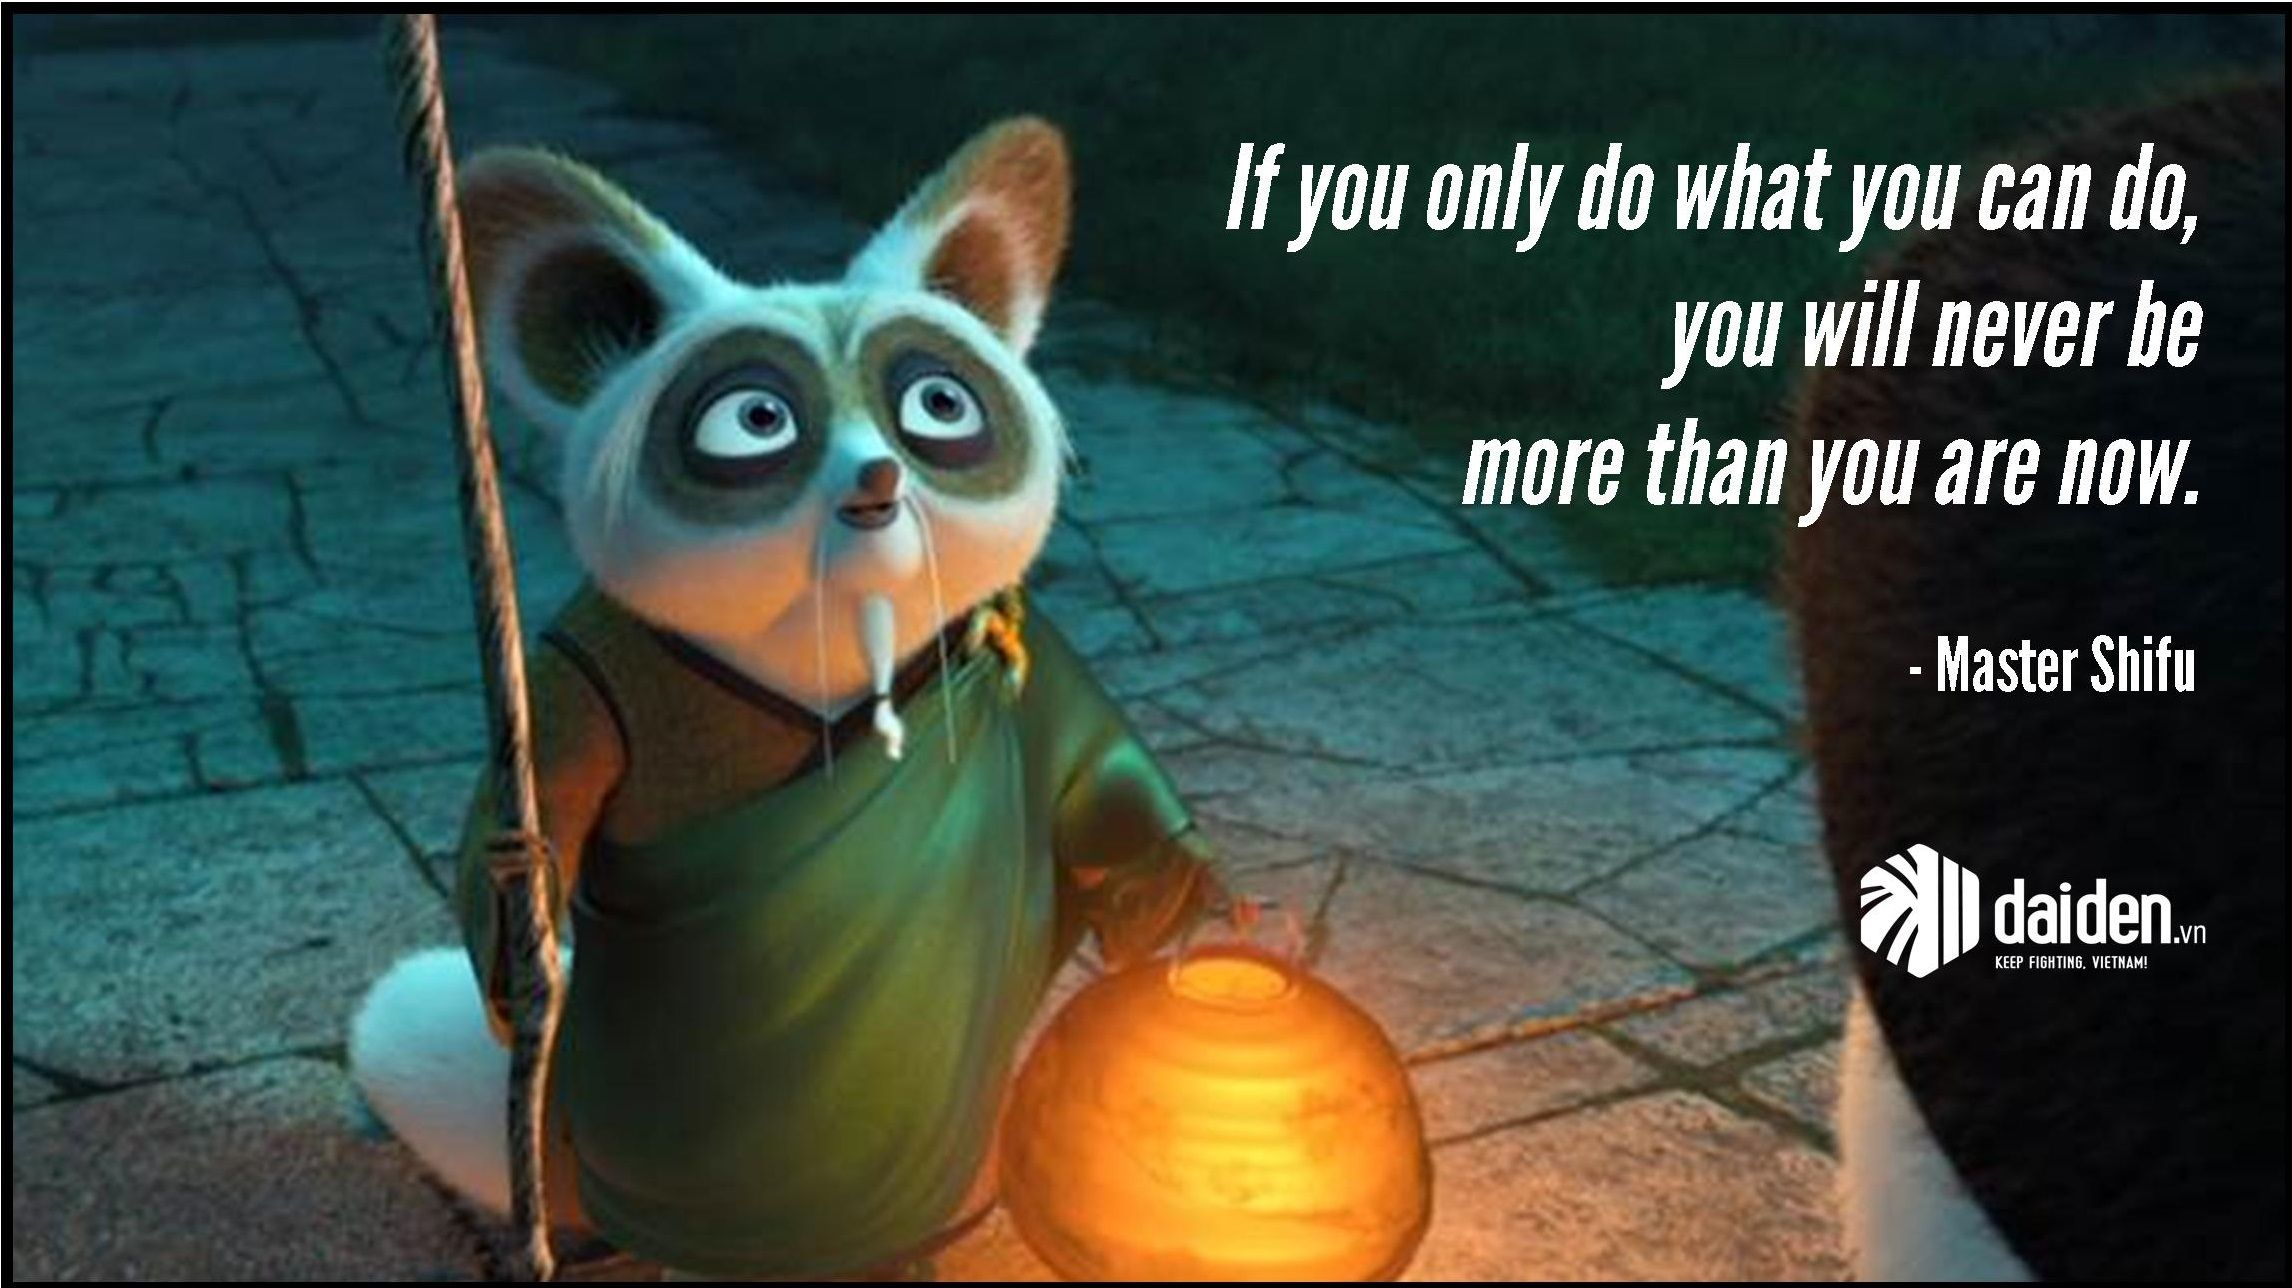 Watch Kung Fu Panda 2 Online (Full Movie) | MetaReel.com